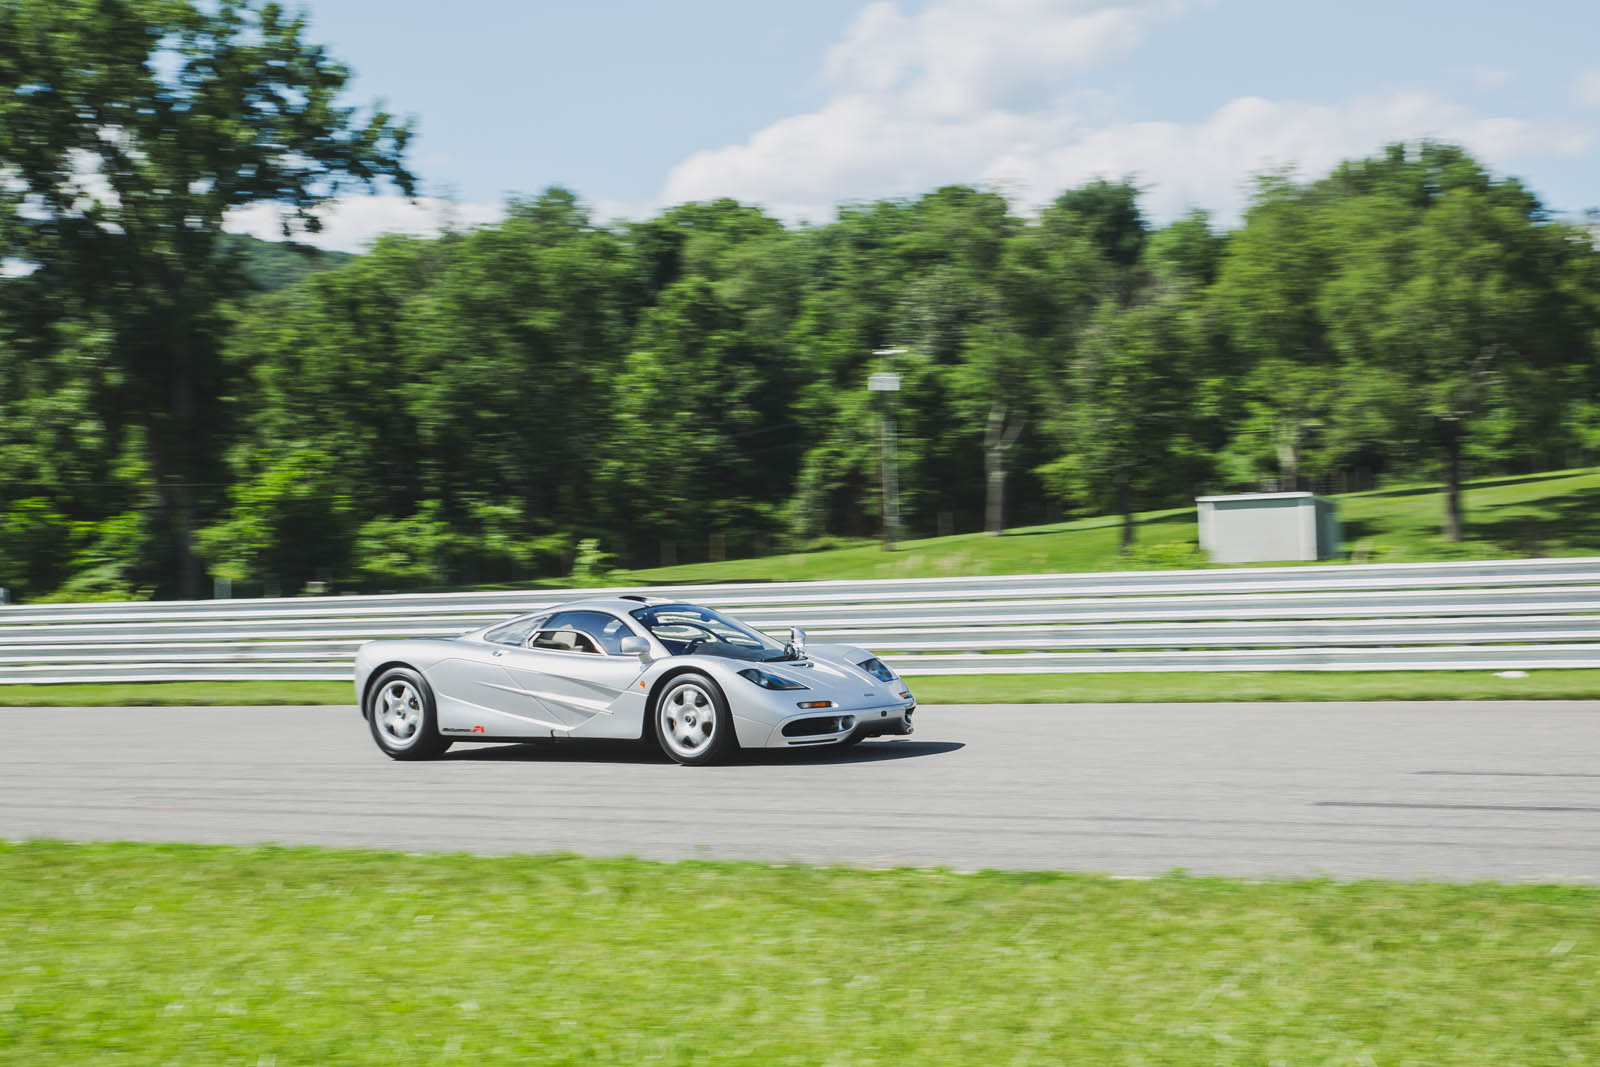 McLaren_F1-37 copy